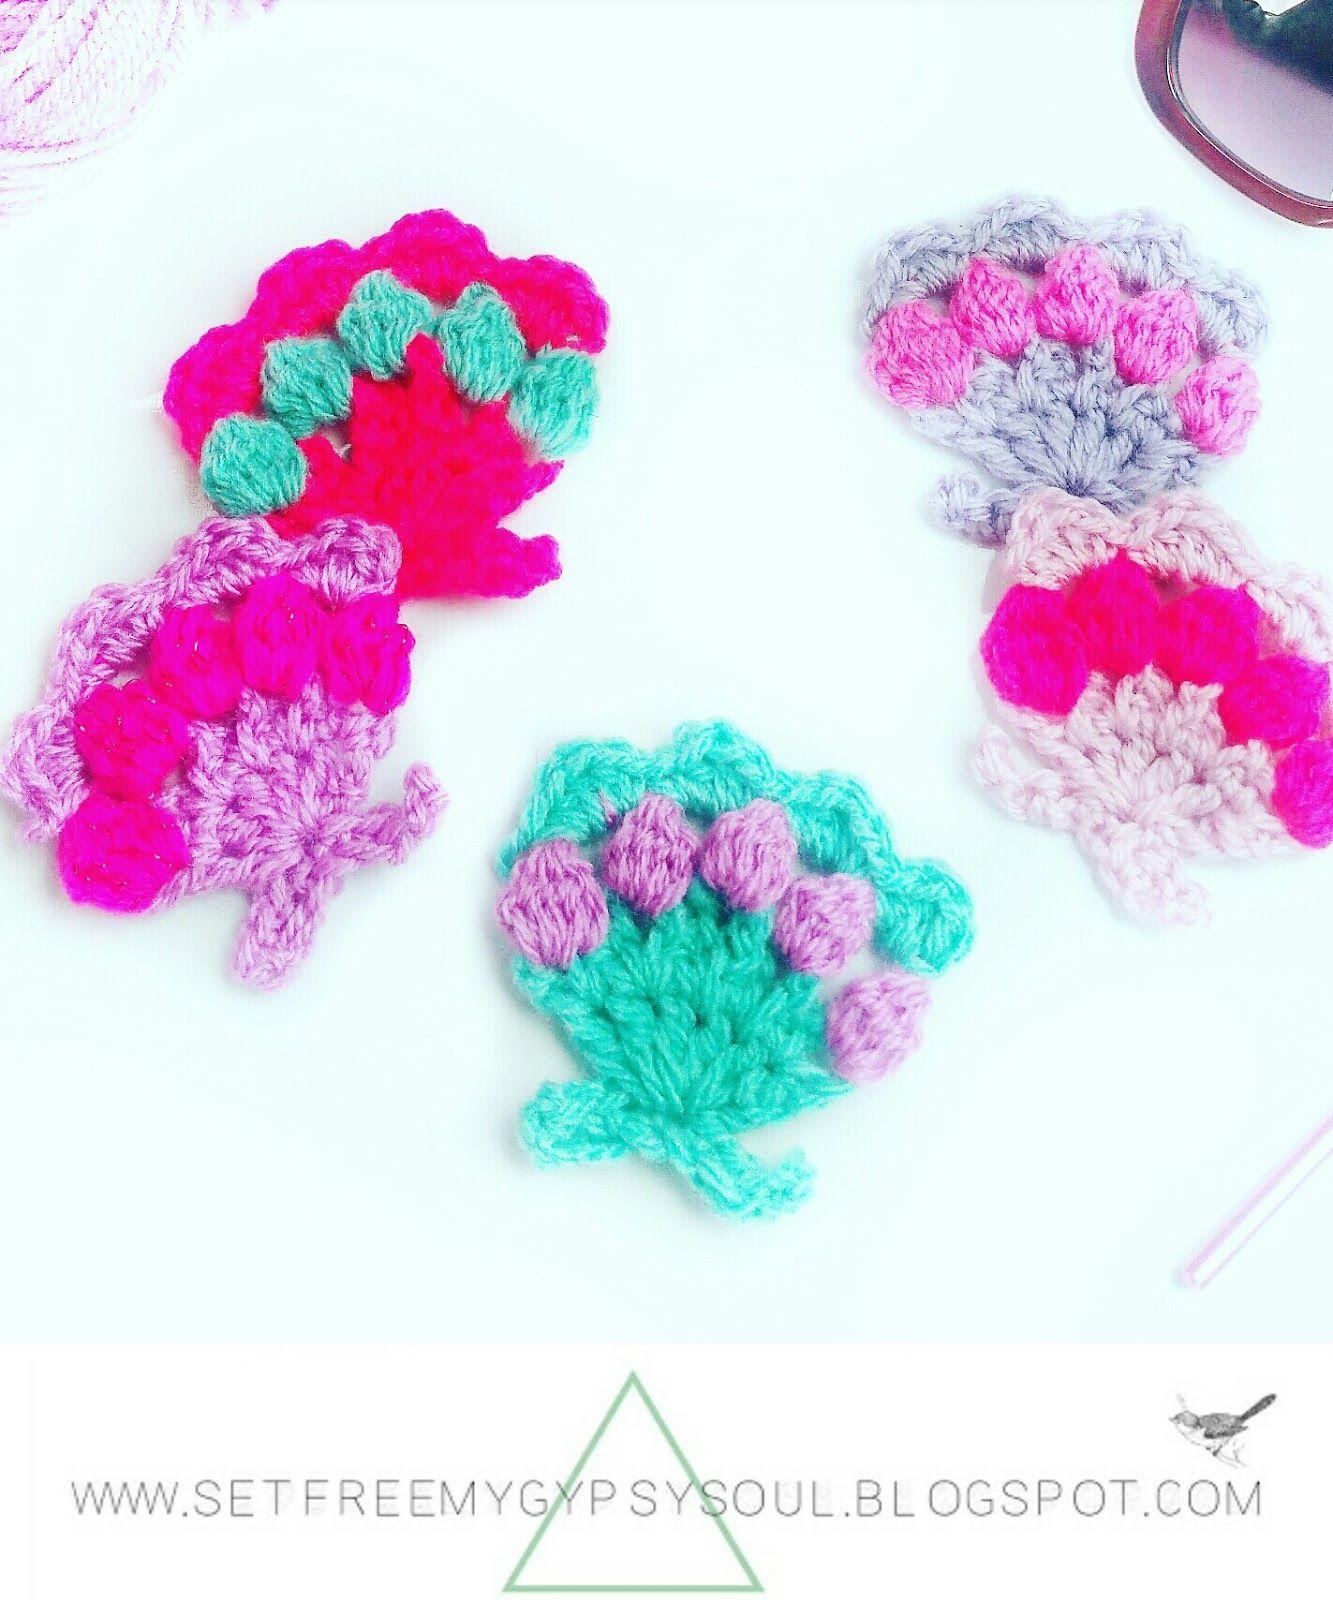 Mermaid Pastel Sea Shells With Bobble Stitch Diy Ideas Pinterest